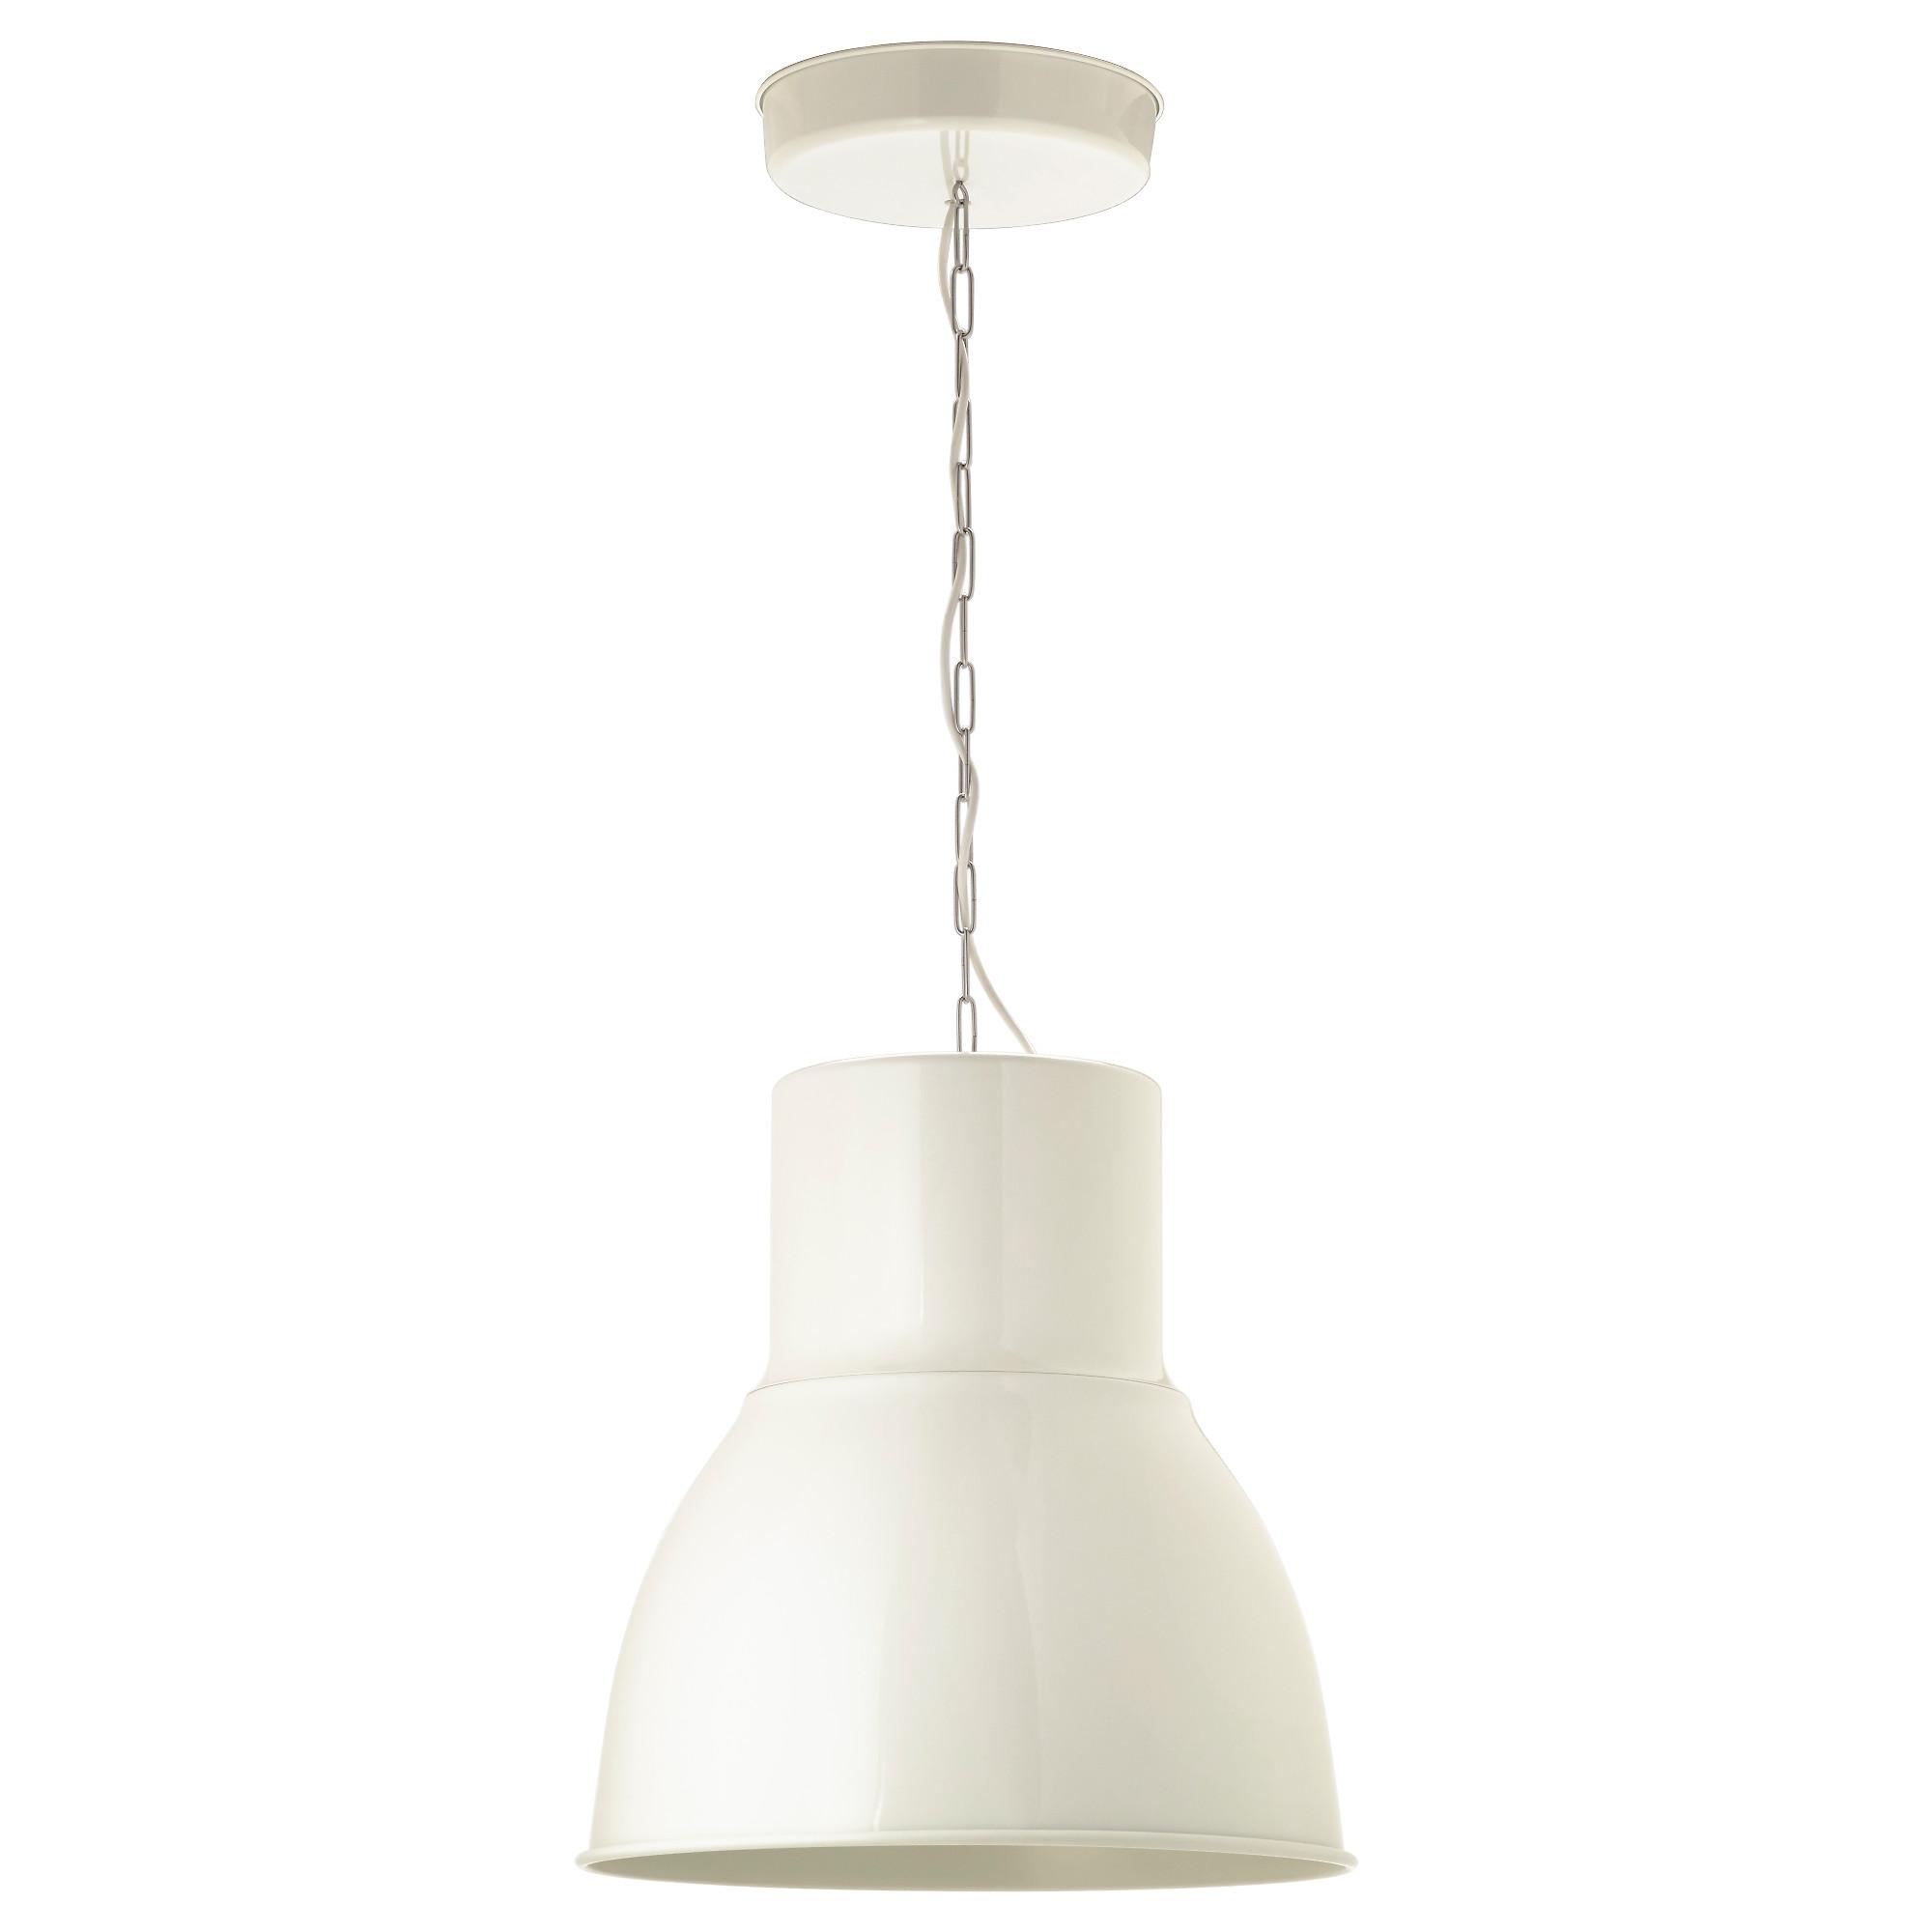 ceiling lamp ikea hektar pendant lamp WDNXTIZ